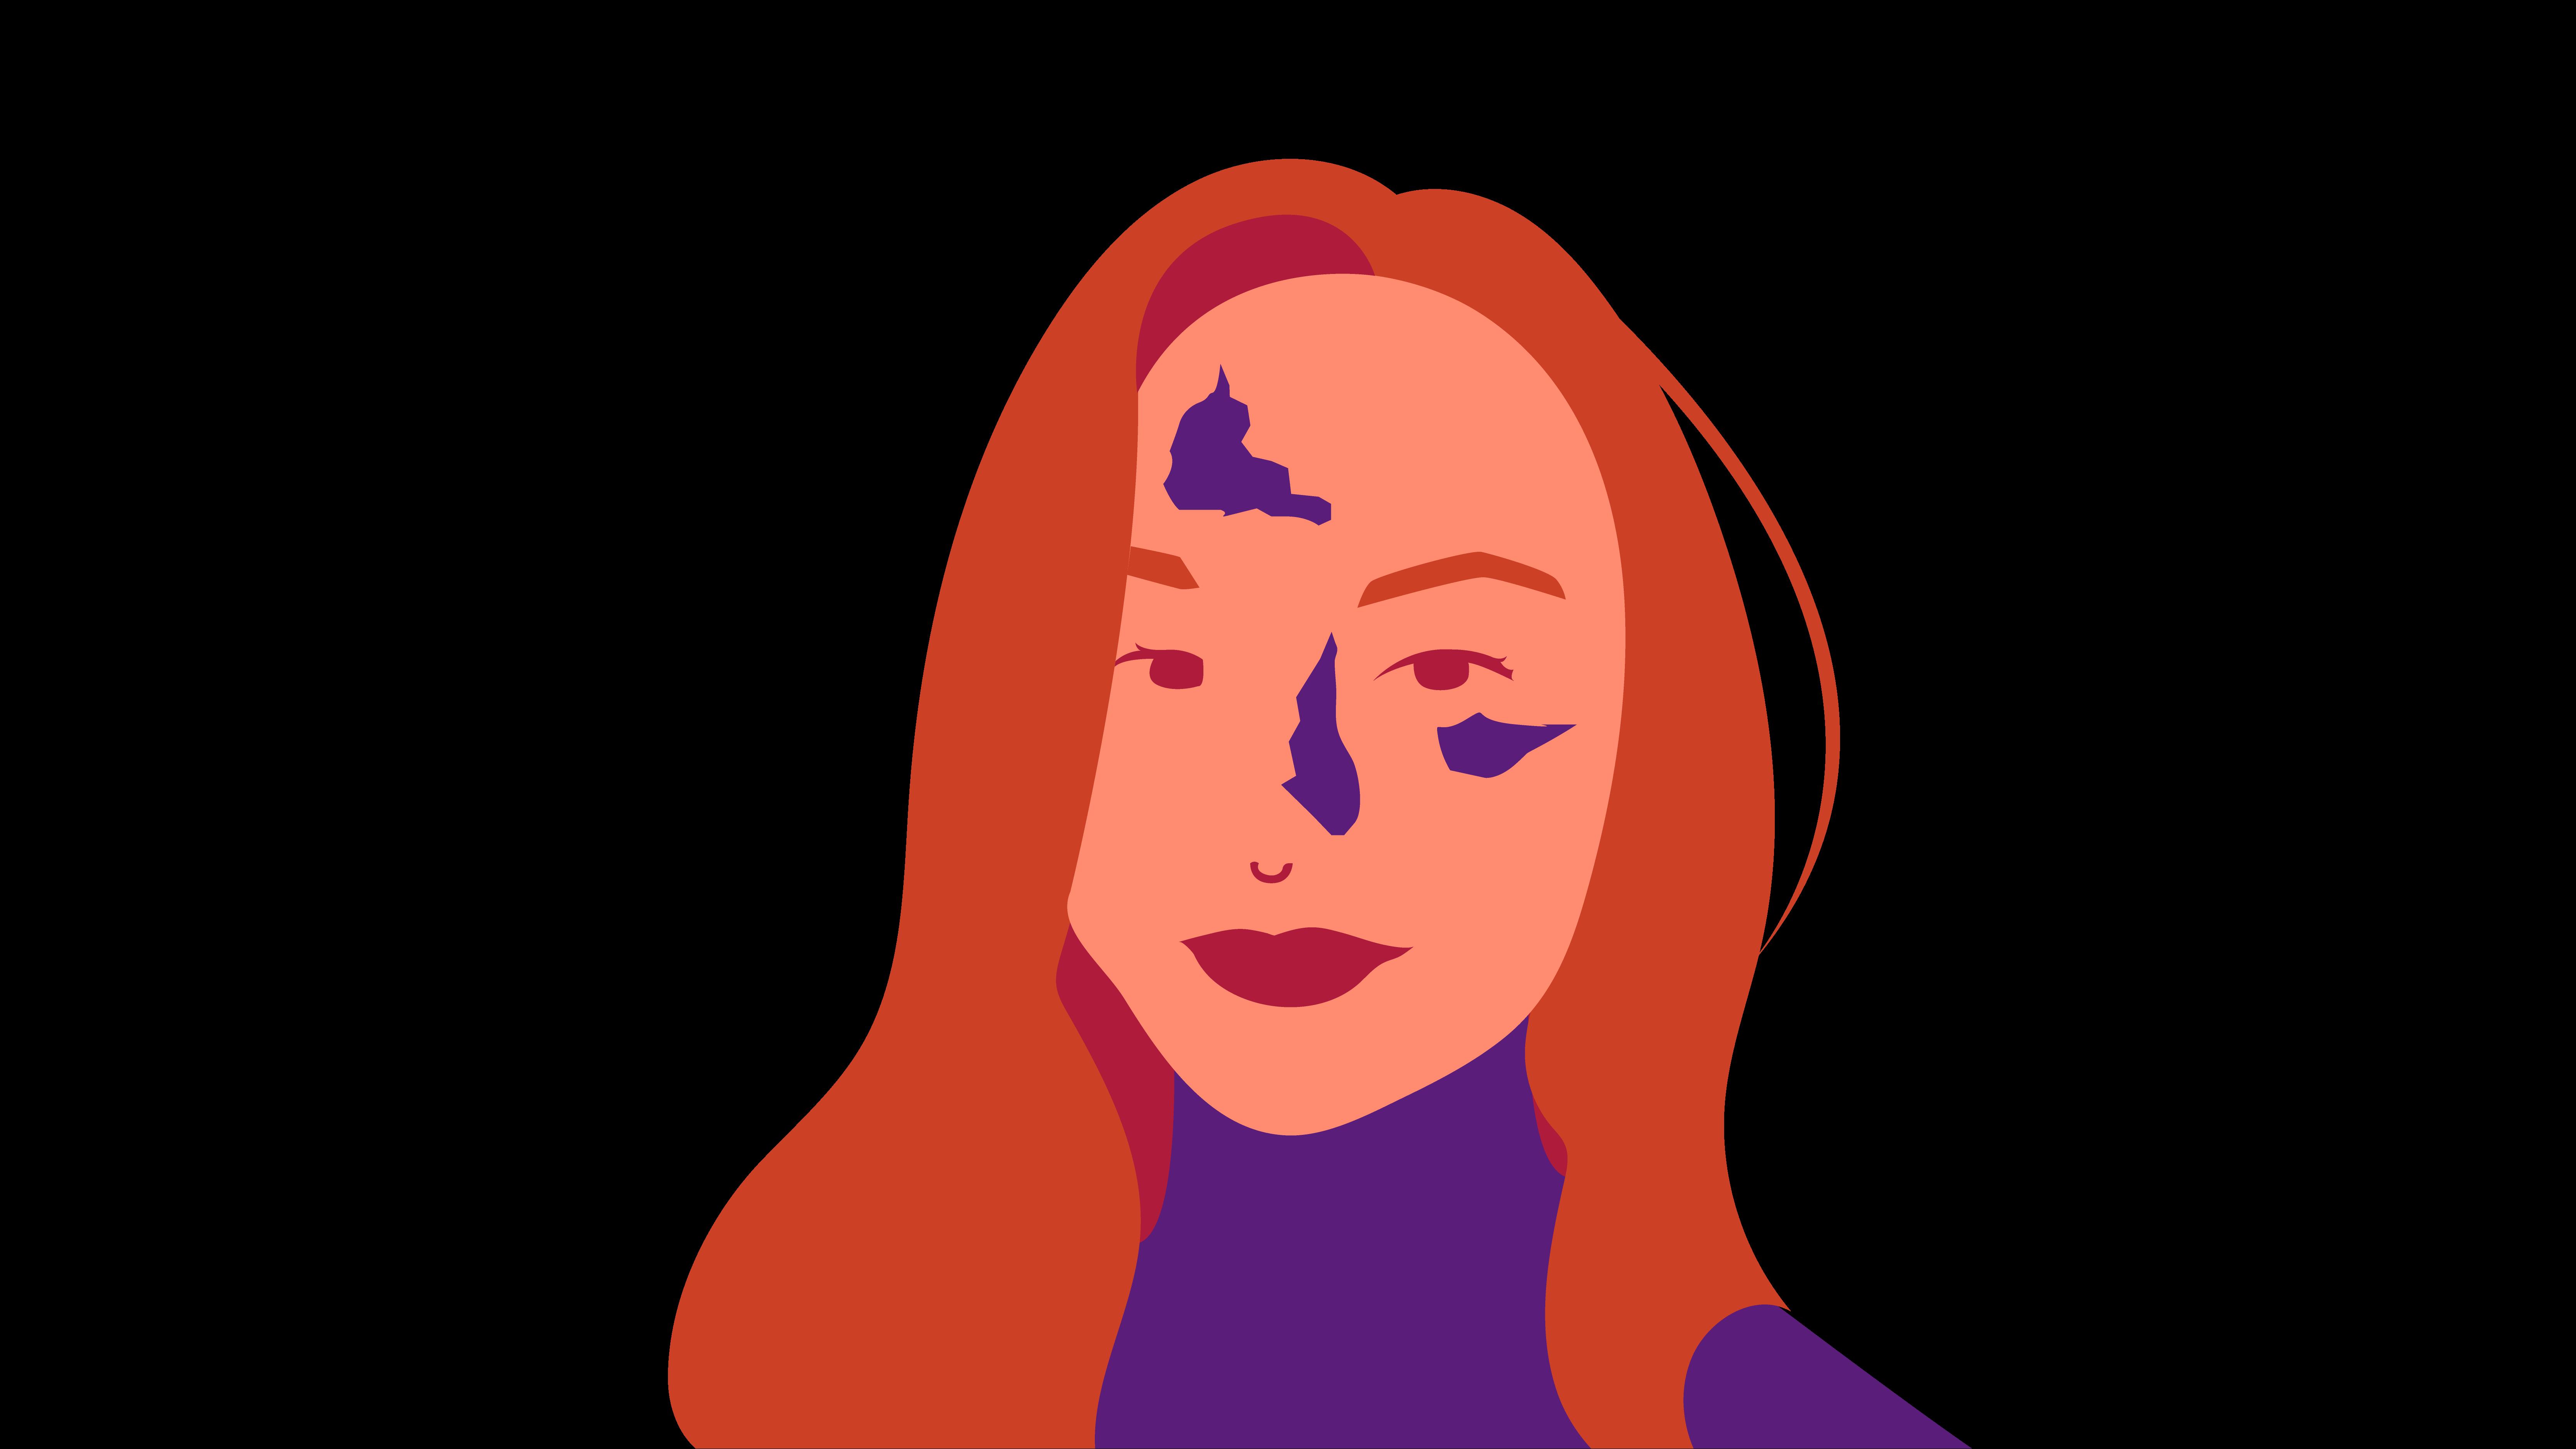 Jade Lopez - Graphic by Ally Rzesa / Beacon Staff